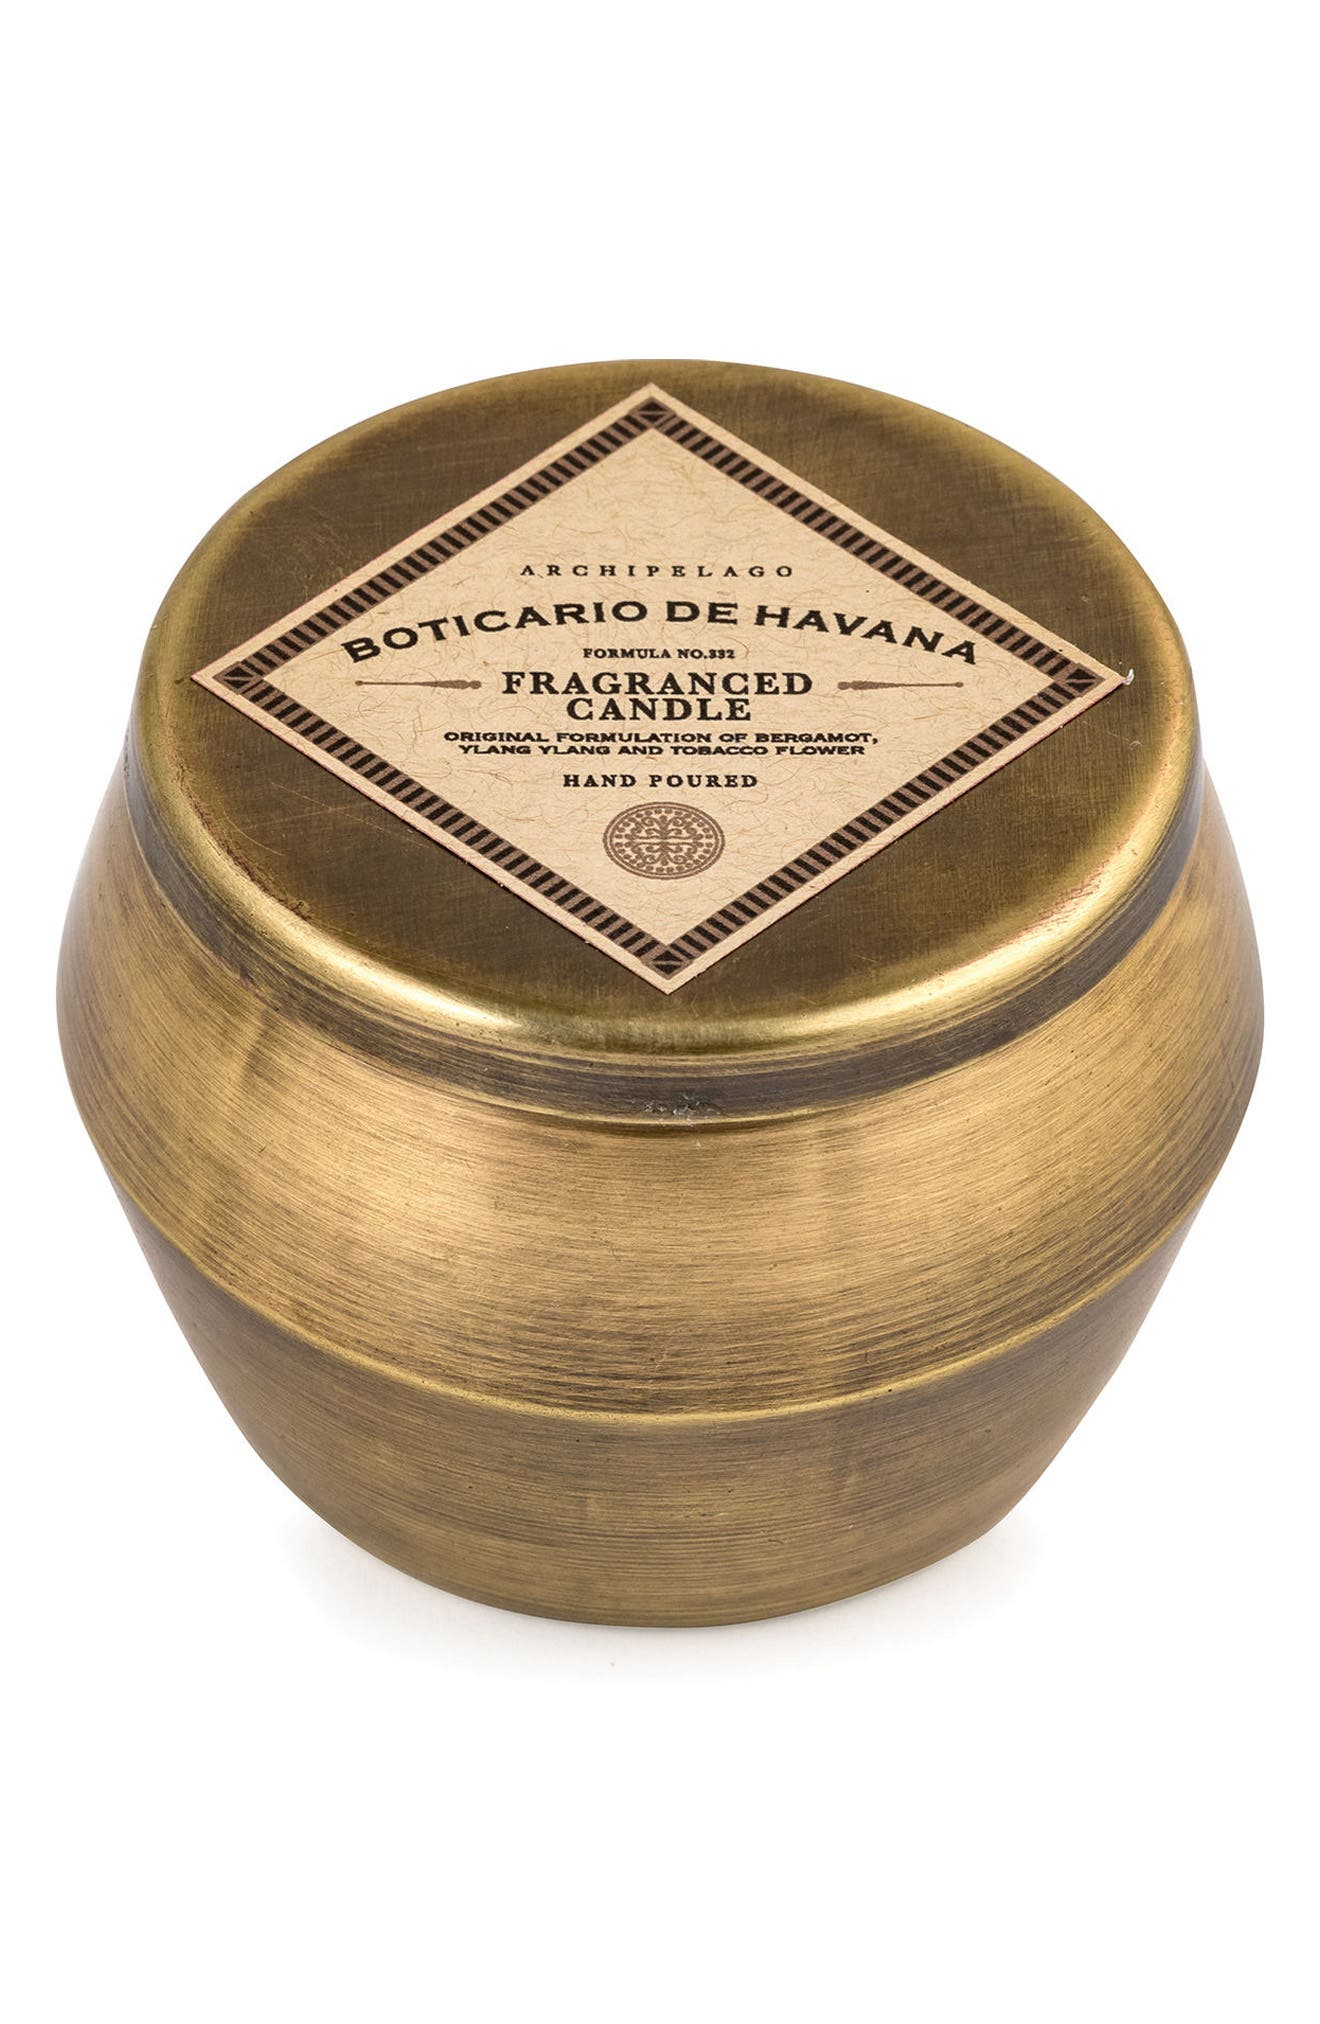 Main Image - Archipelago Botanicals Botanico de Havana Scented Tin Candle